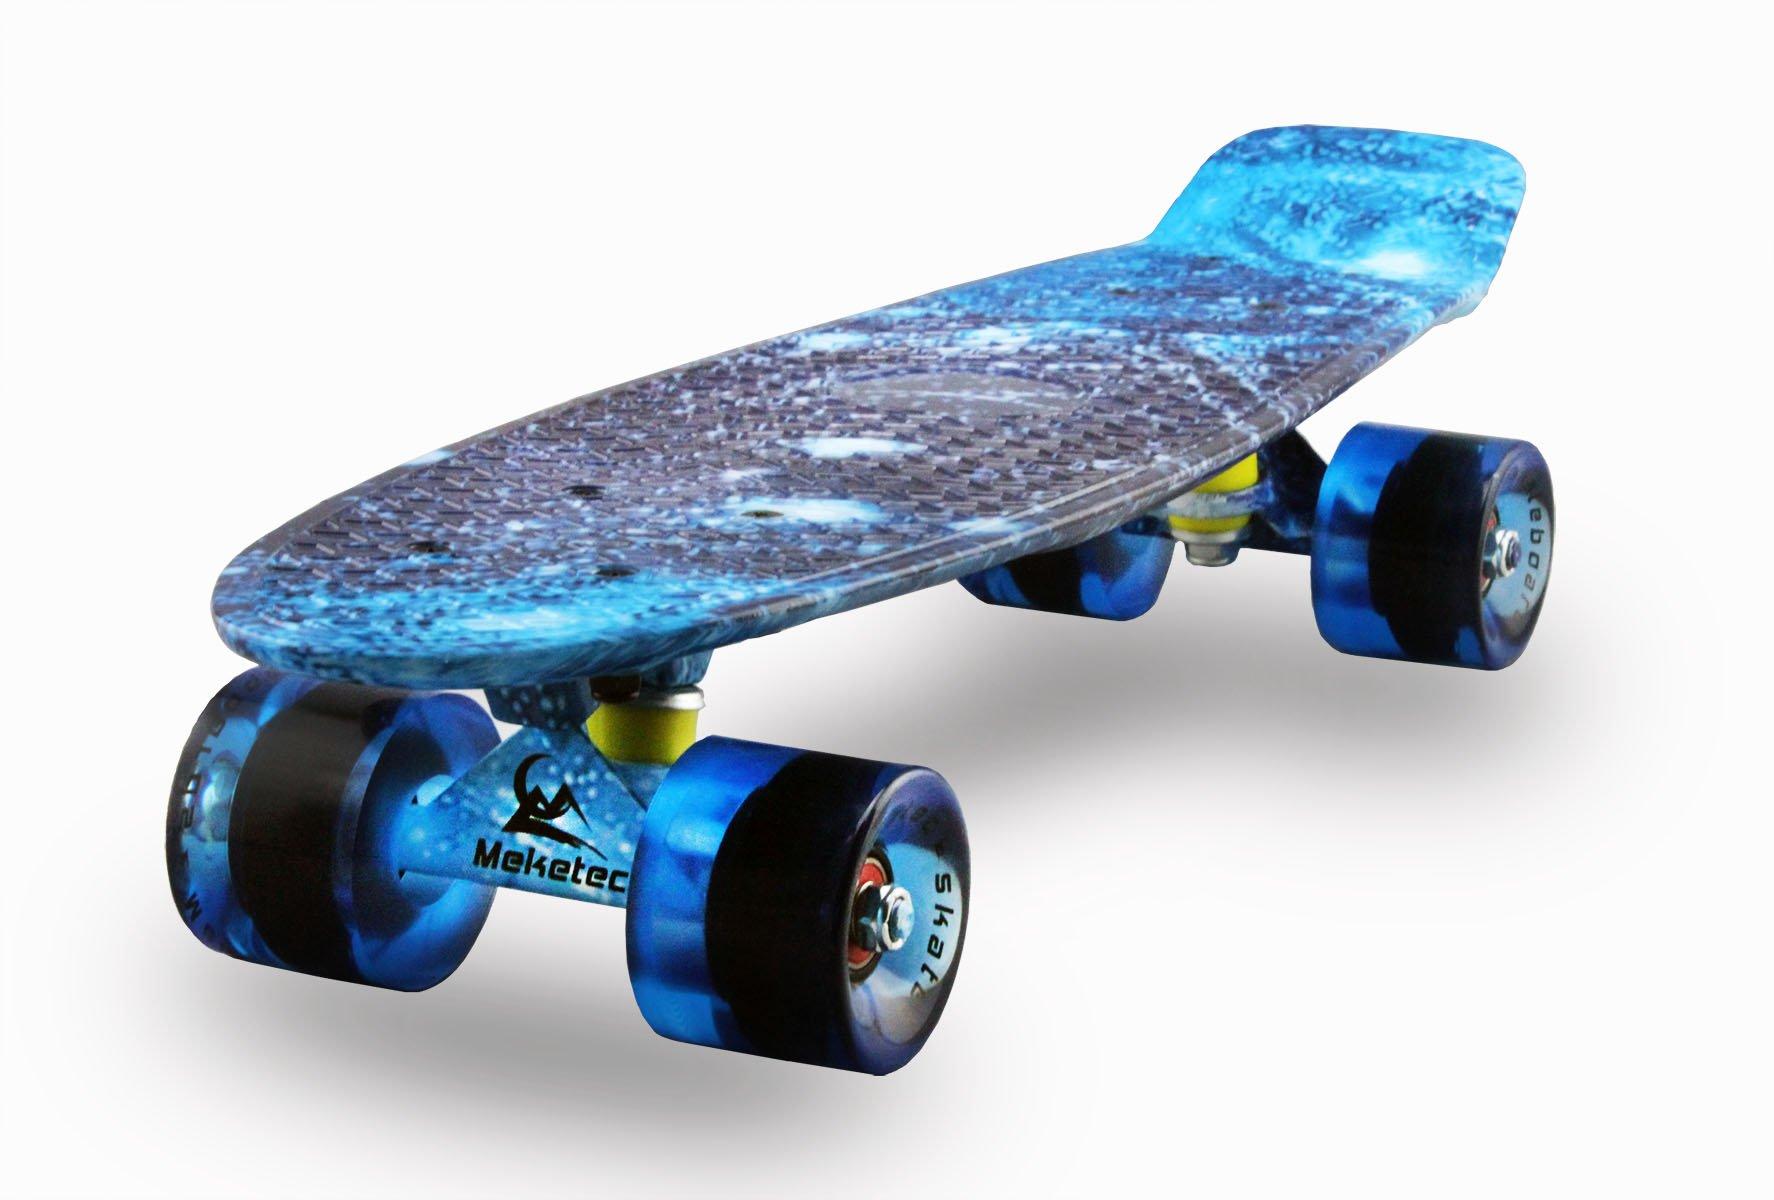 MEKETEC Skateboards Complete Mini Cruiser Retro Skateboard for Kids Boys Youths Beginners 22 Inch(The starry sky)